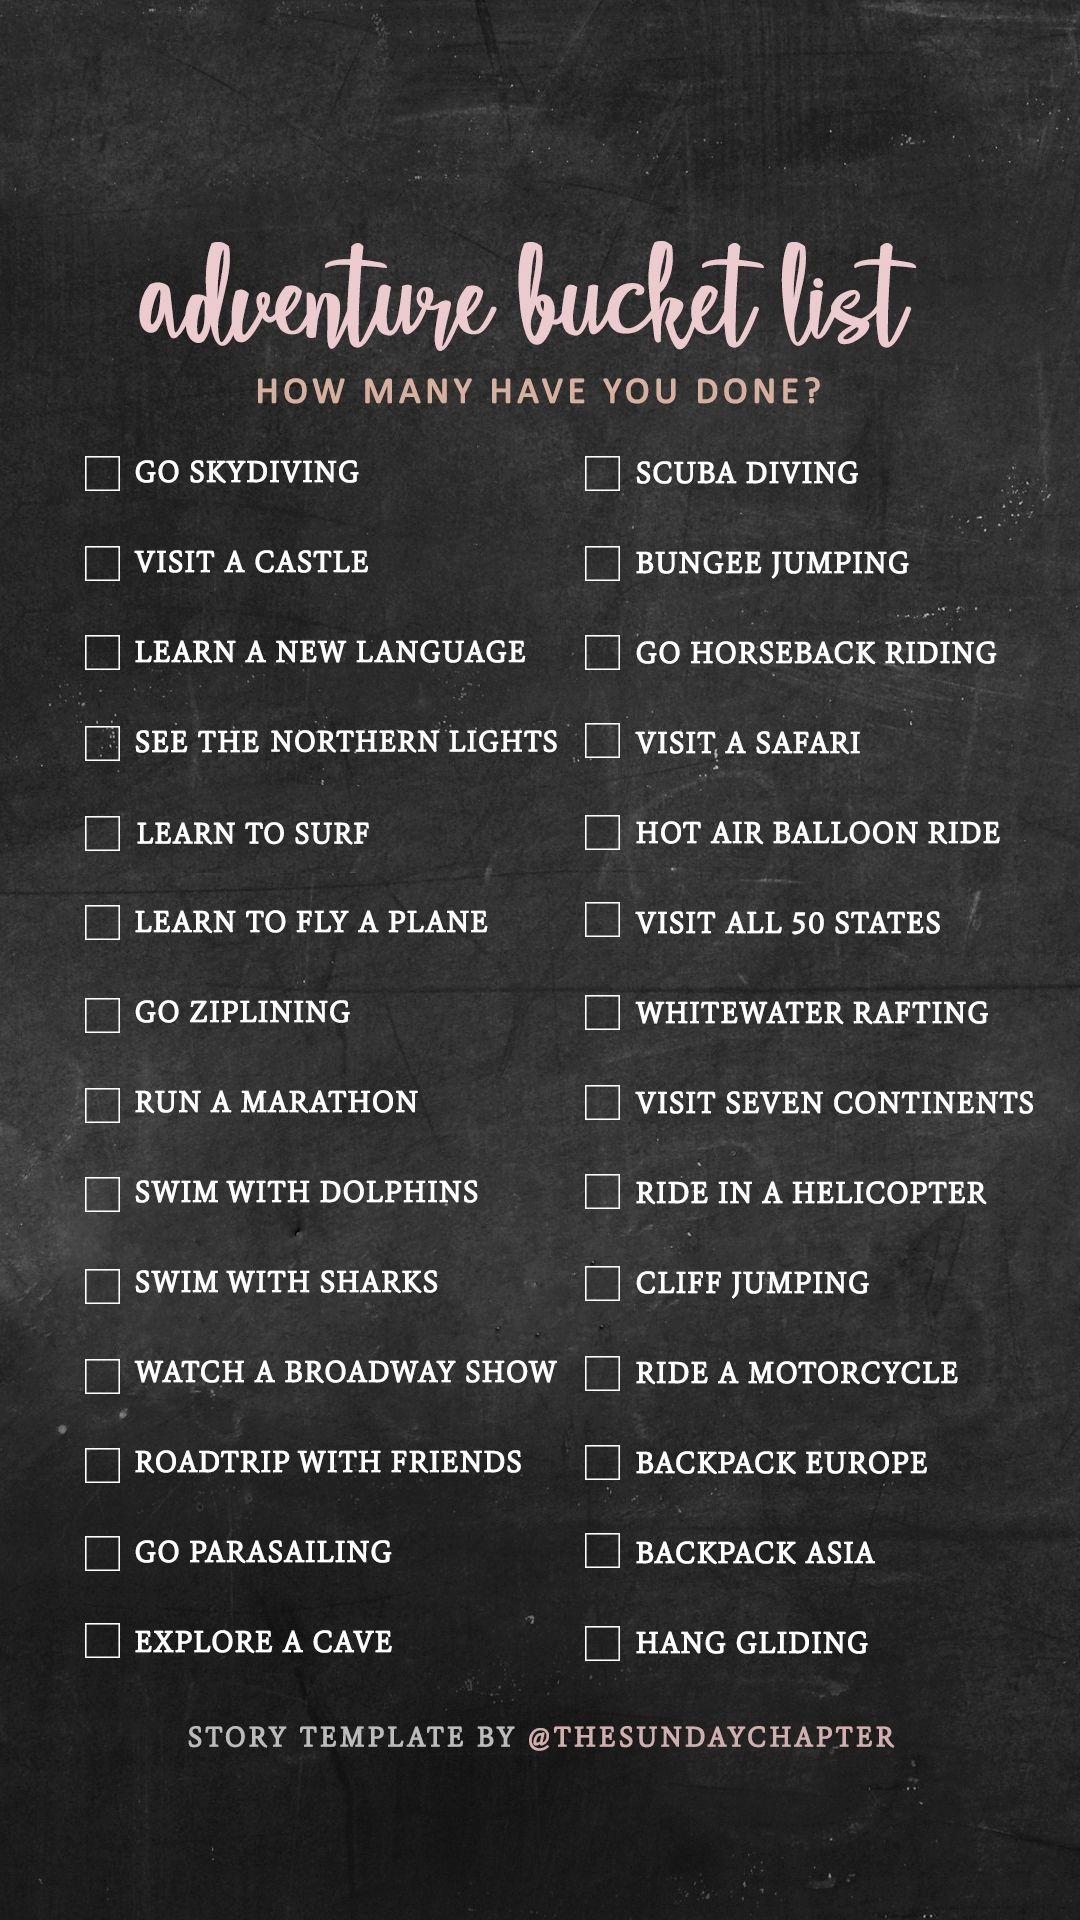 adventure travel bucket list challenge instagram story ...